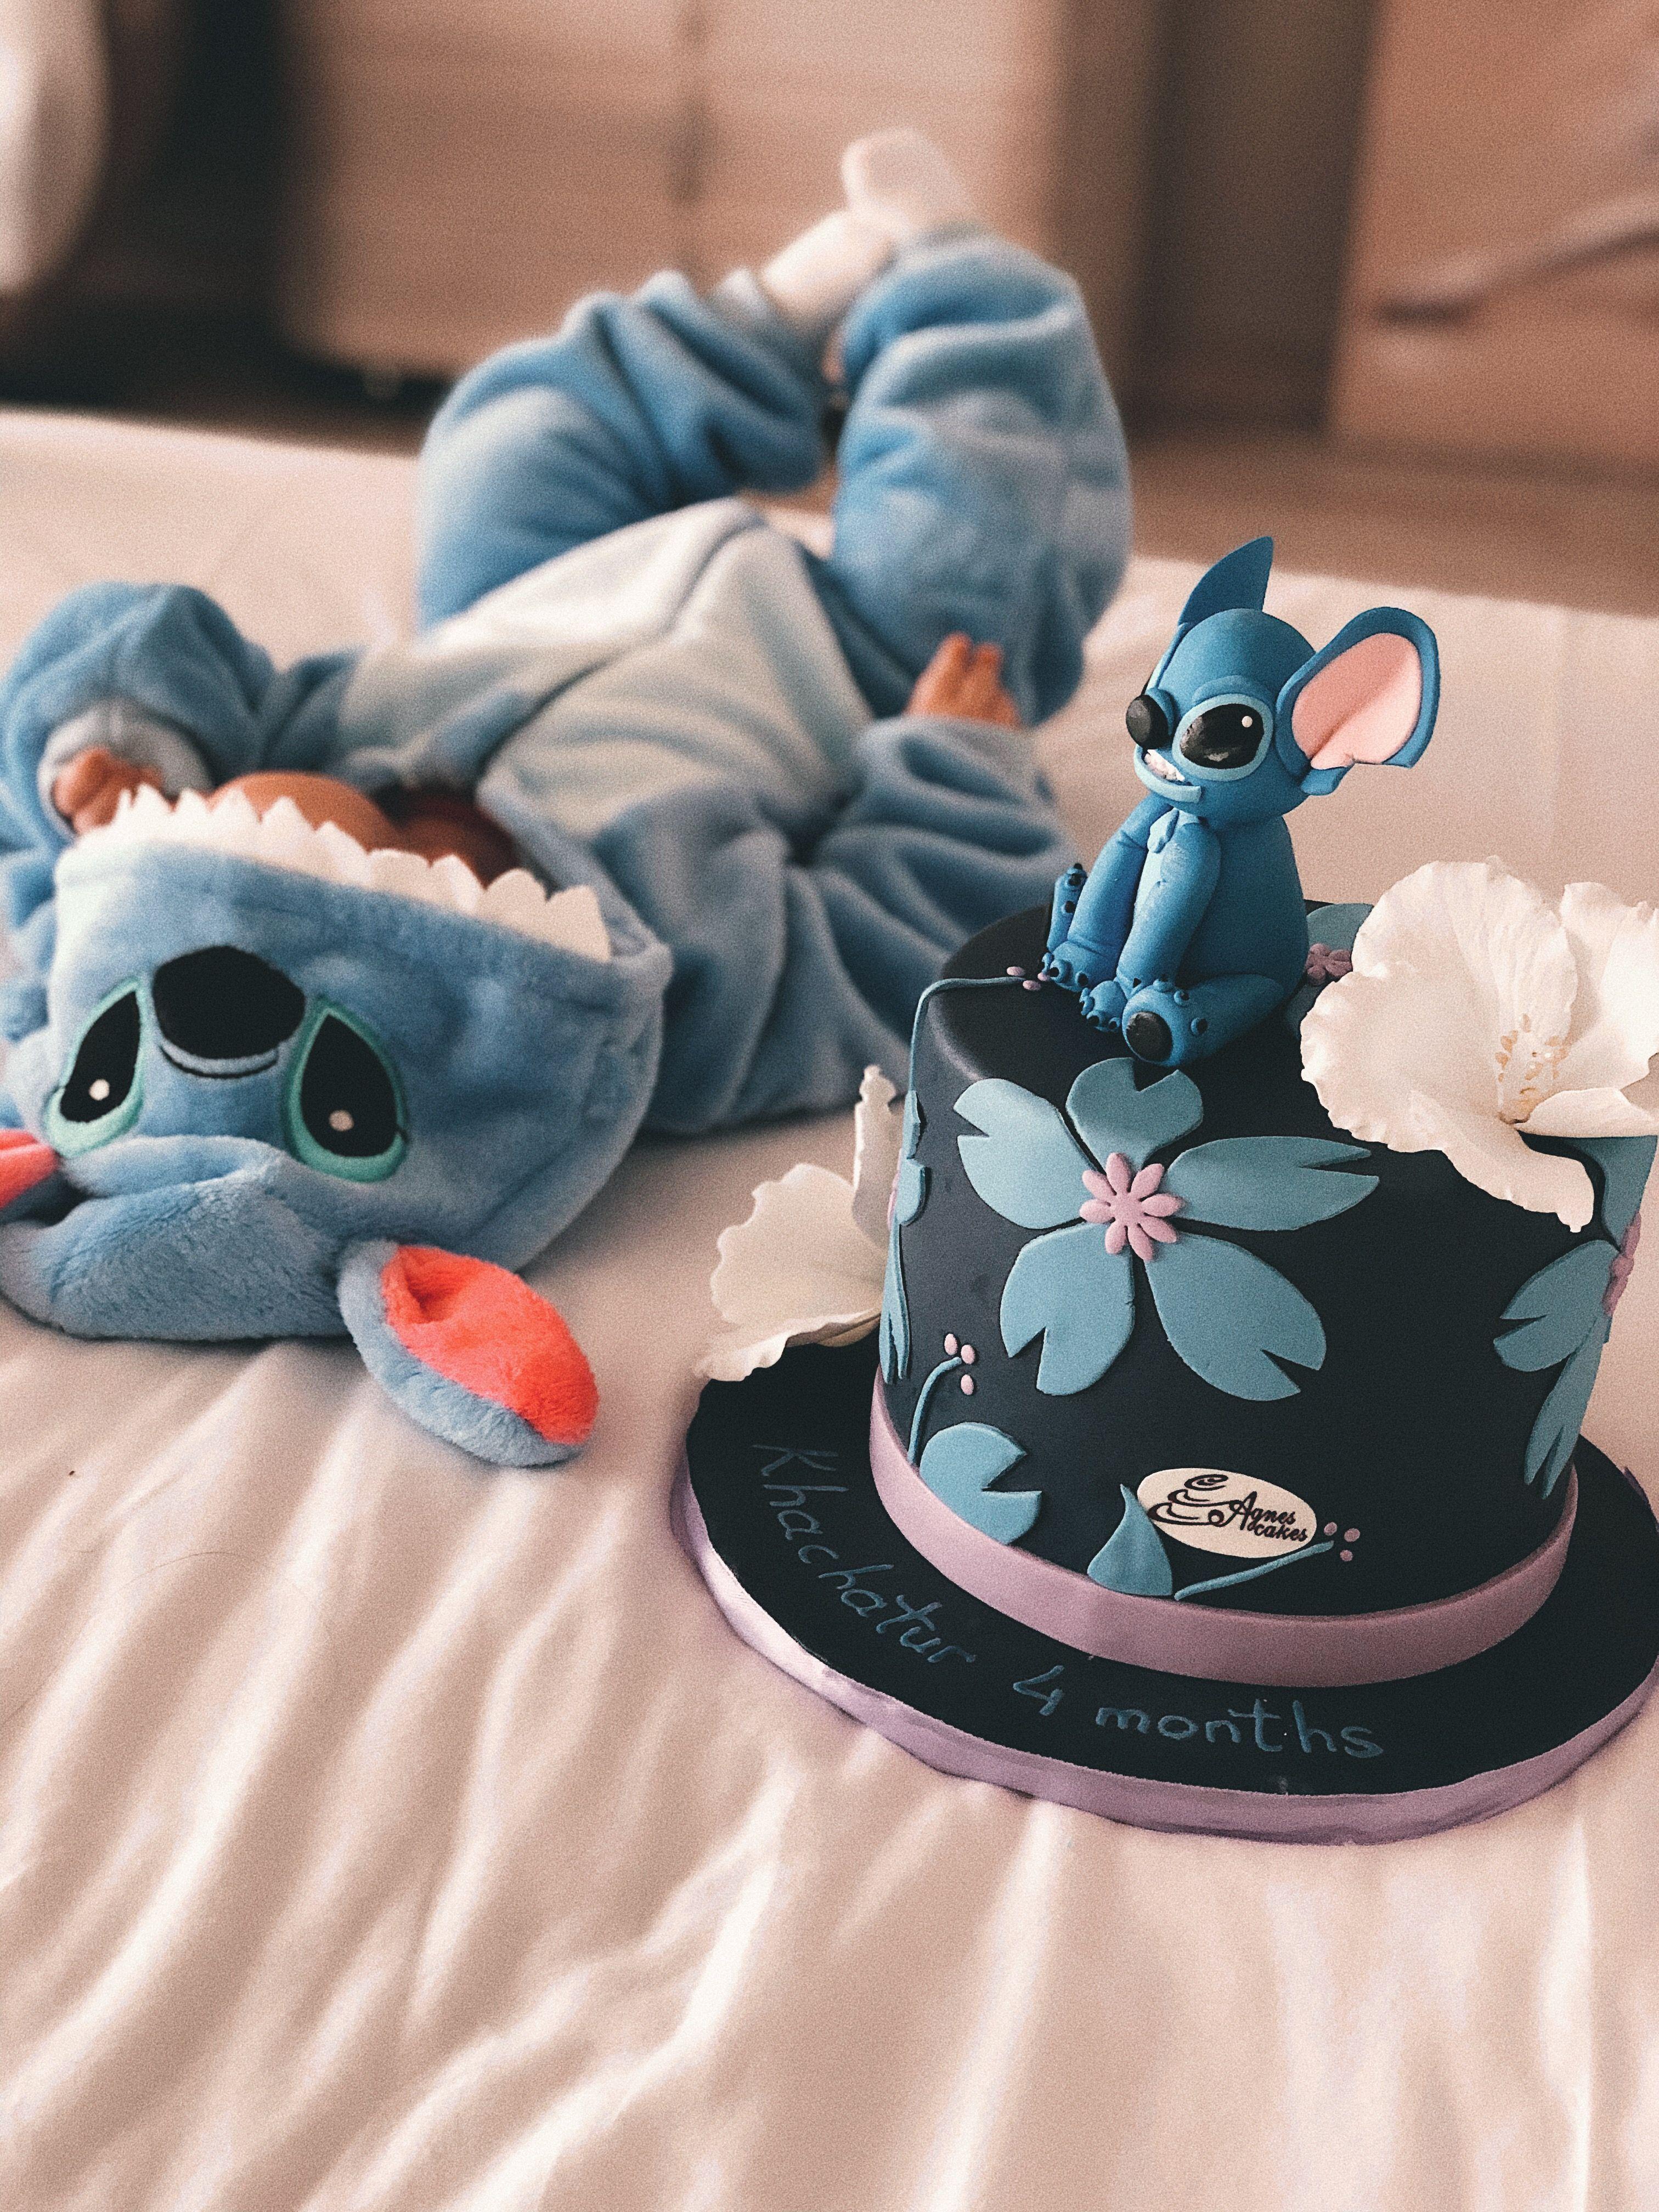 Baby stitch in 2020 stitch cake cute babies birthday